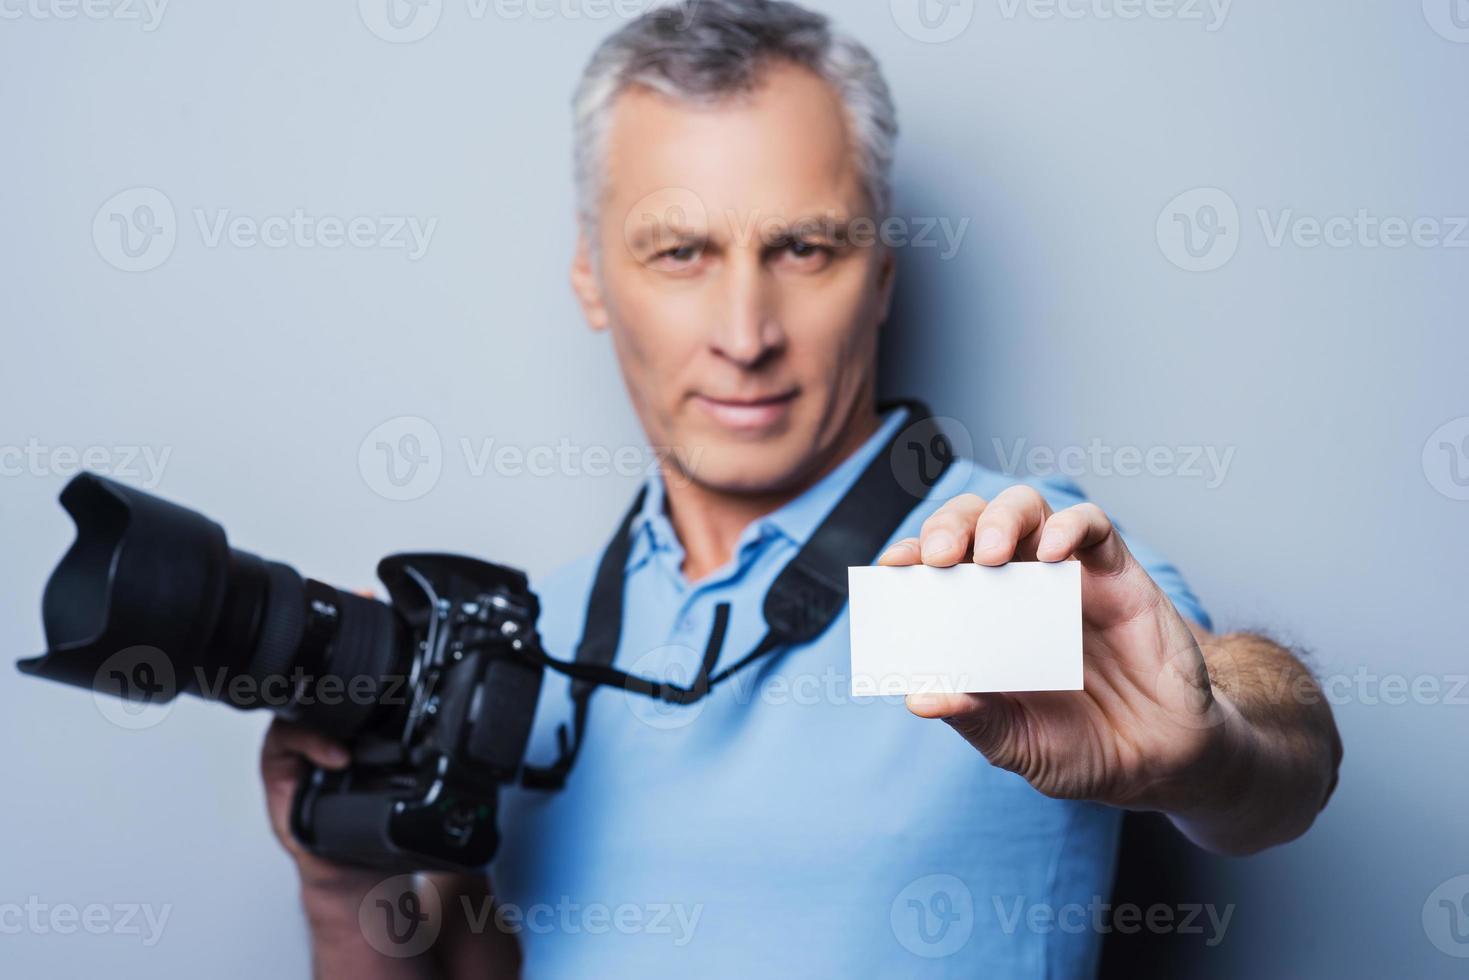 professionele fotograaf. foto